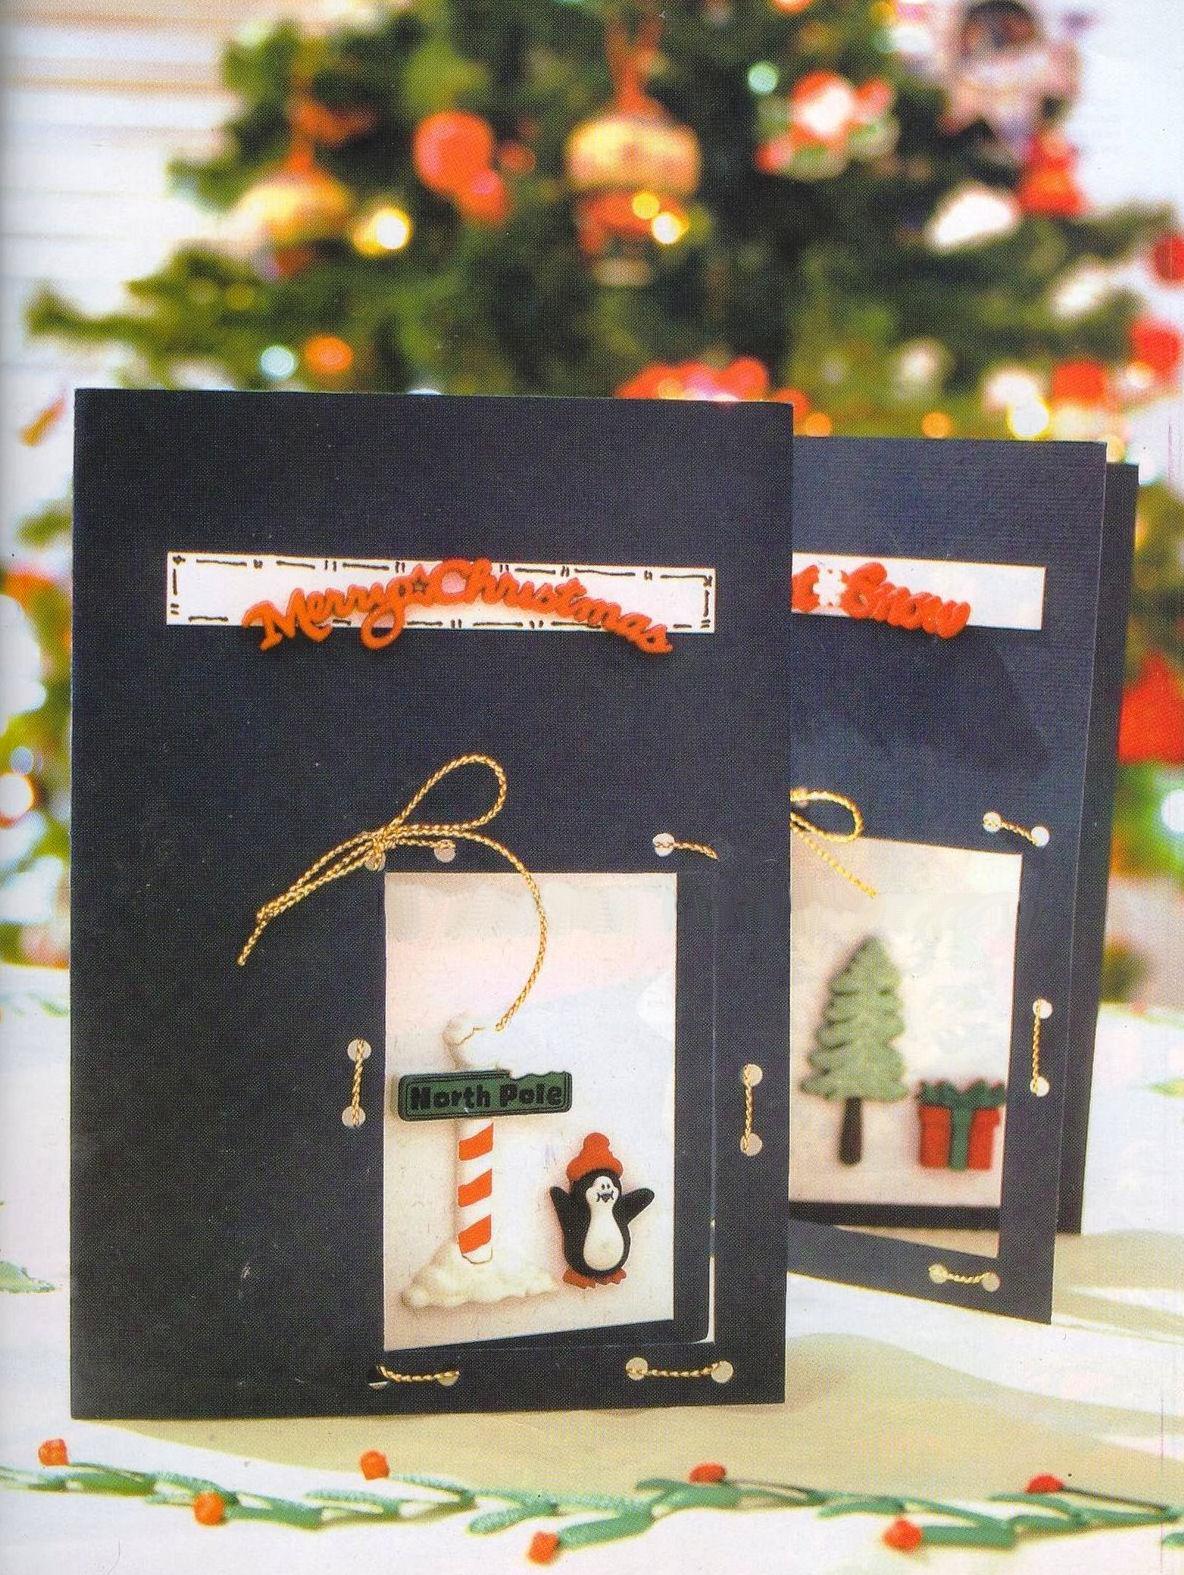 Tarjeta navide a manualidades lodijoella - Manualidades tarjeta navidena ...